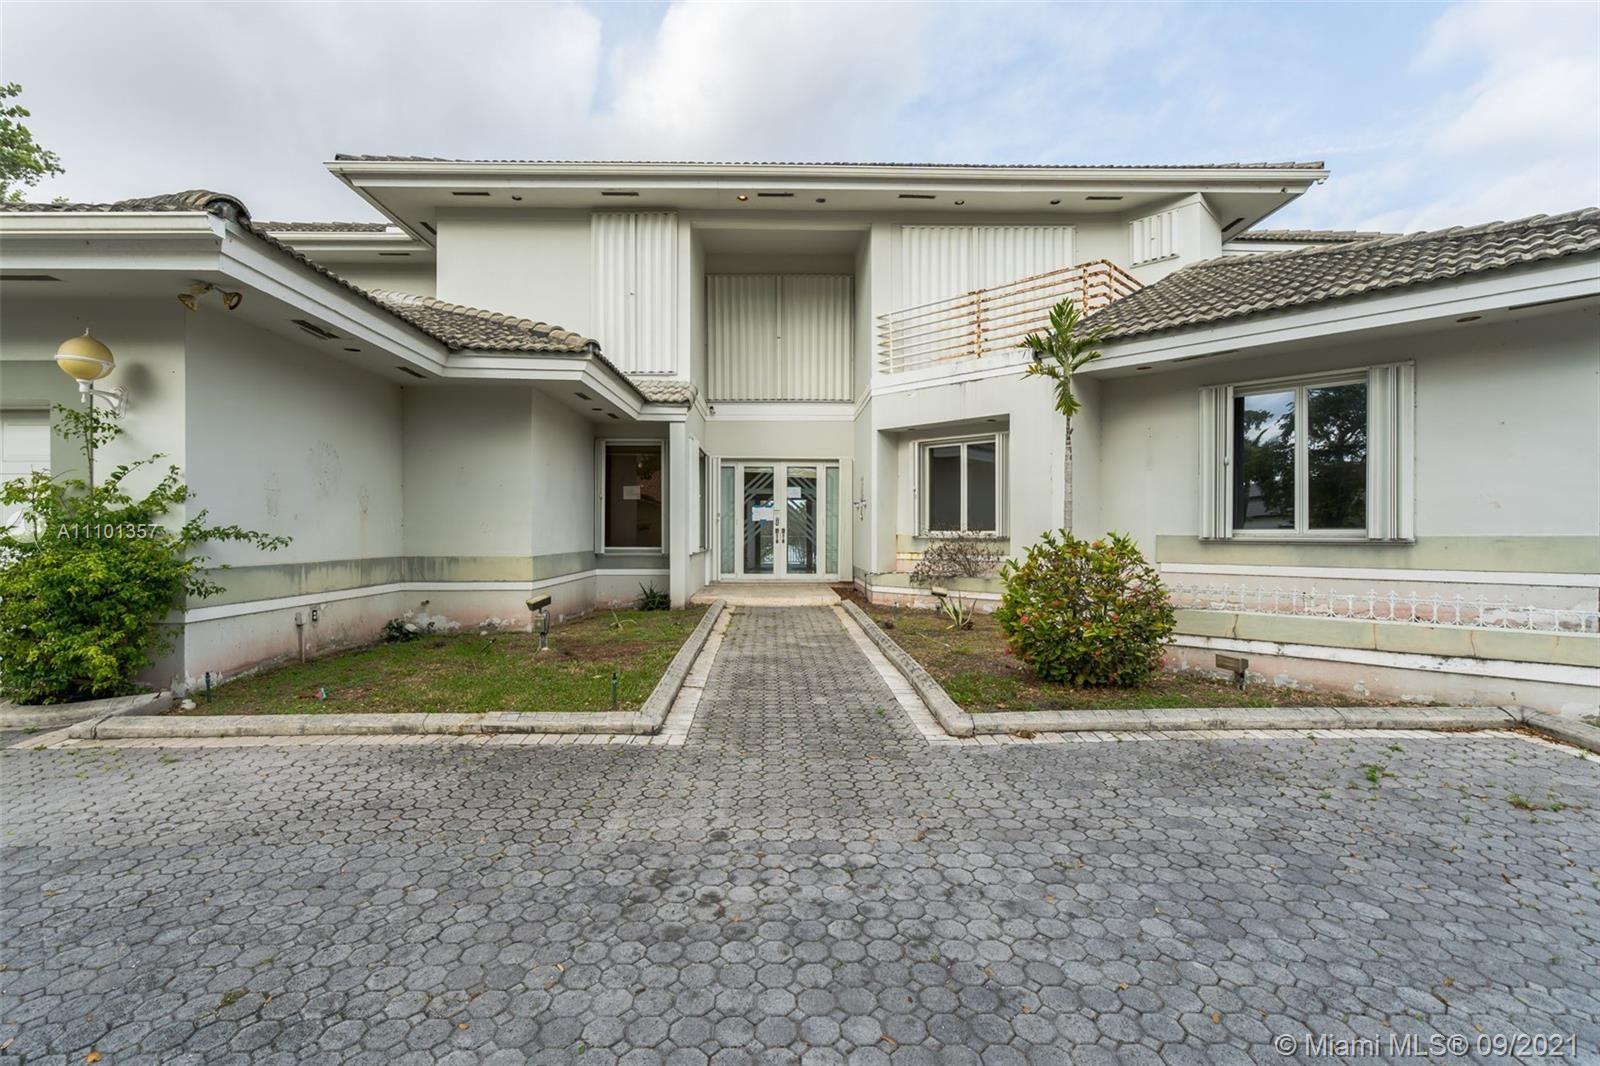 14332 Ardoch Pl, Miami Lakes, FL 33016 - #: A11101357